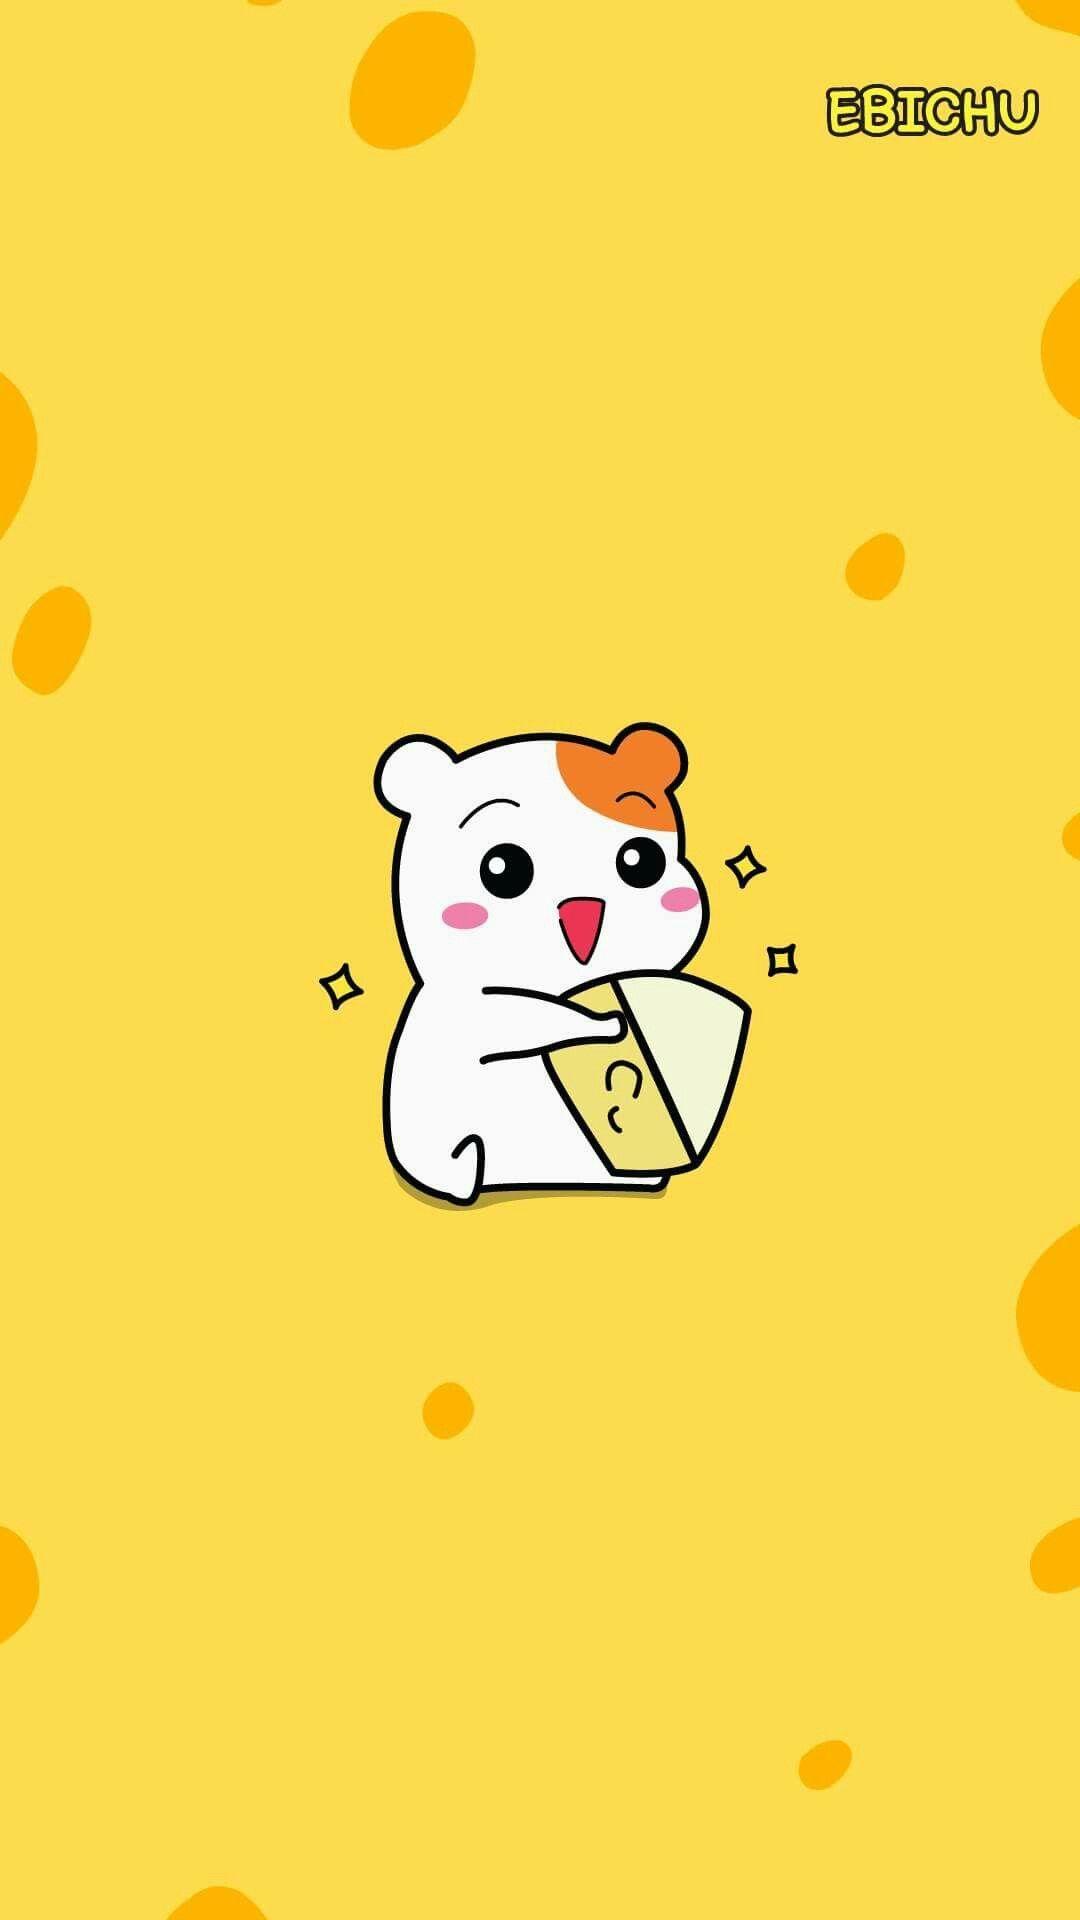 Iphone 6 Lock Screen Wallpaper Girl Ebichu Ebichu In 2019 Cute Wallpapers Kawaii